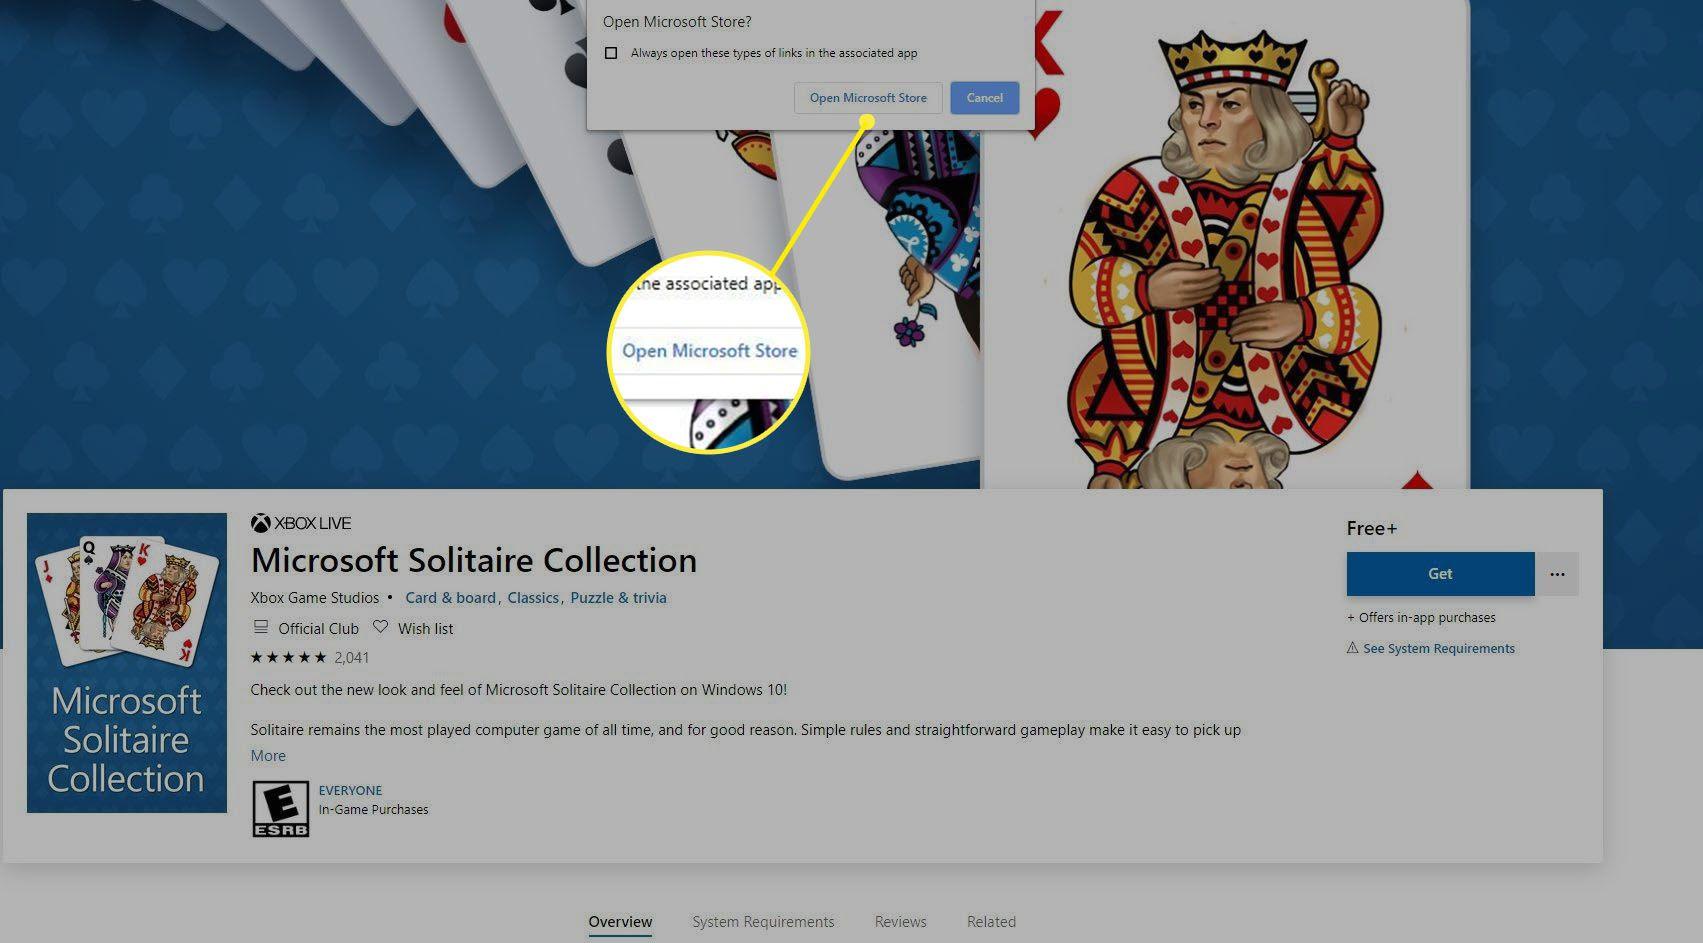 Screenshot of Open Microsoft Store prompt